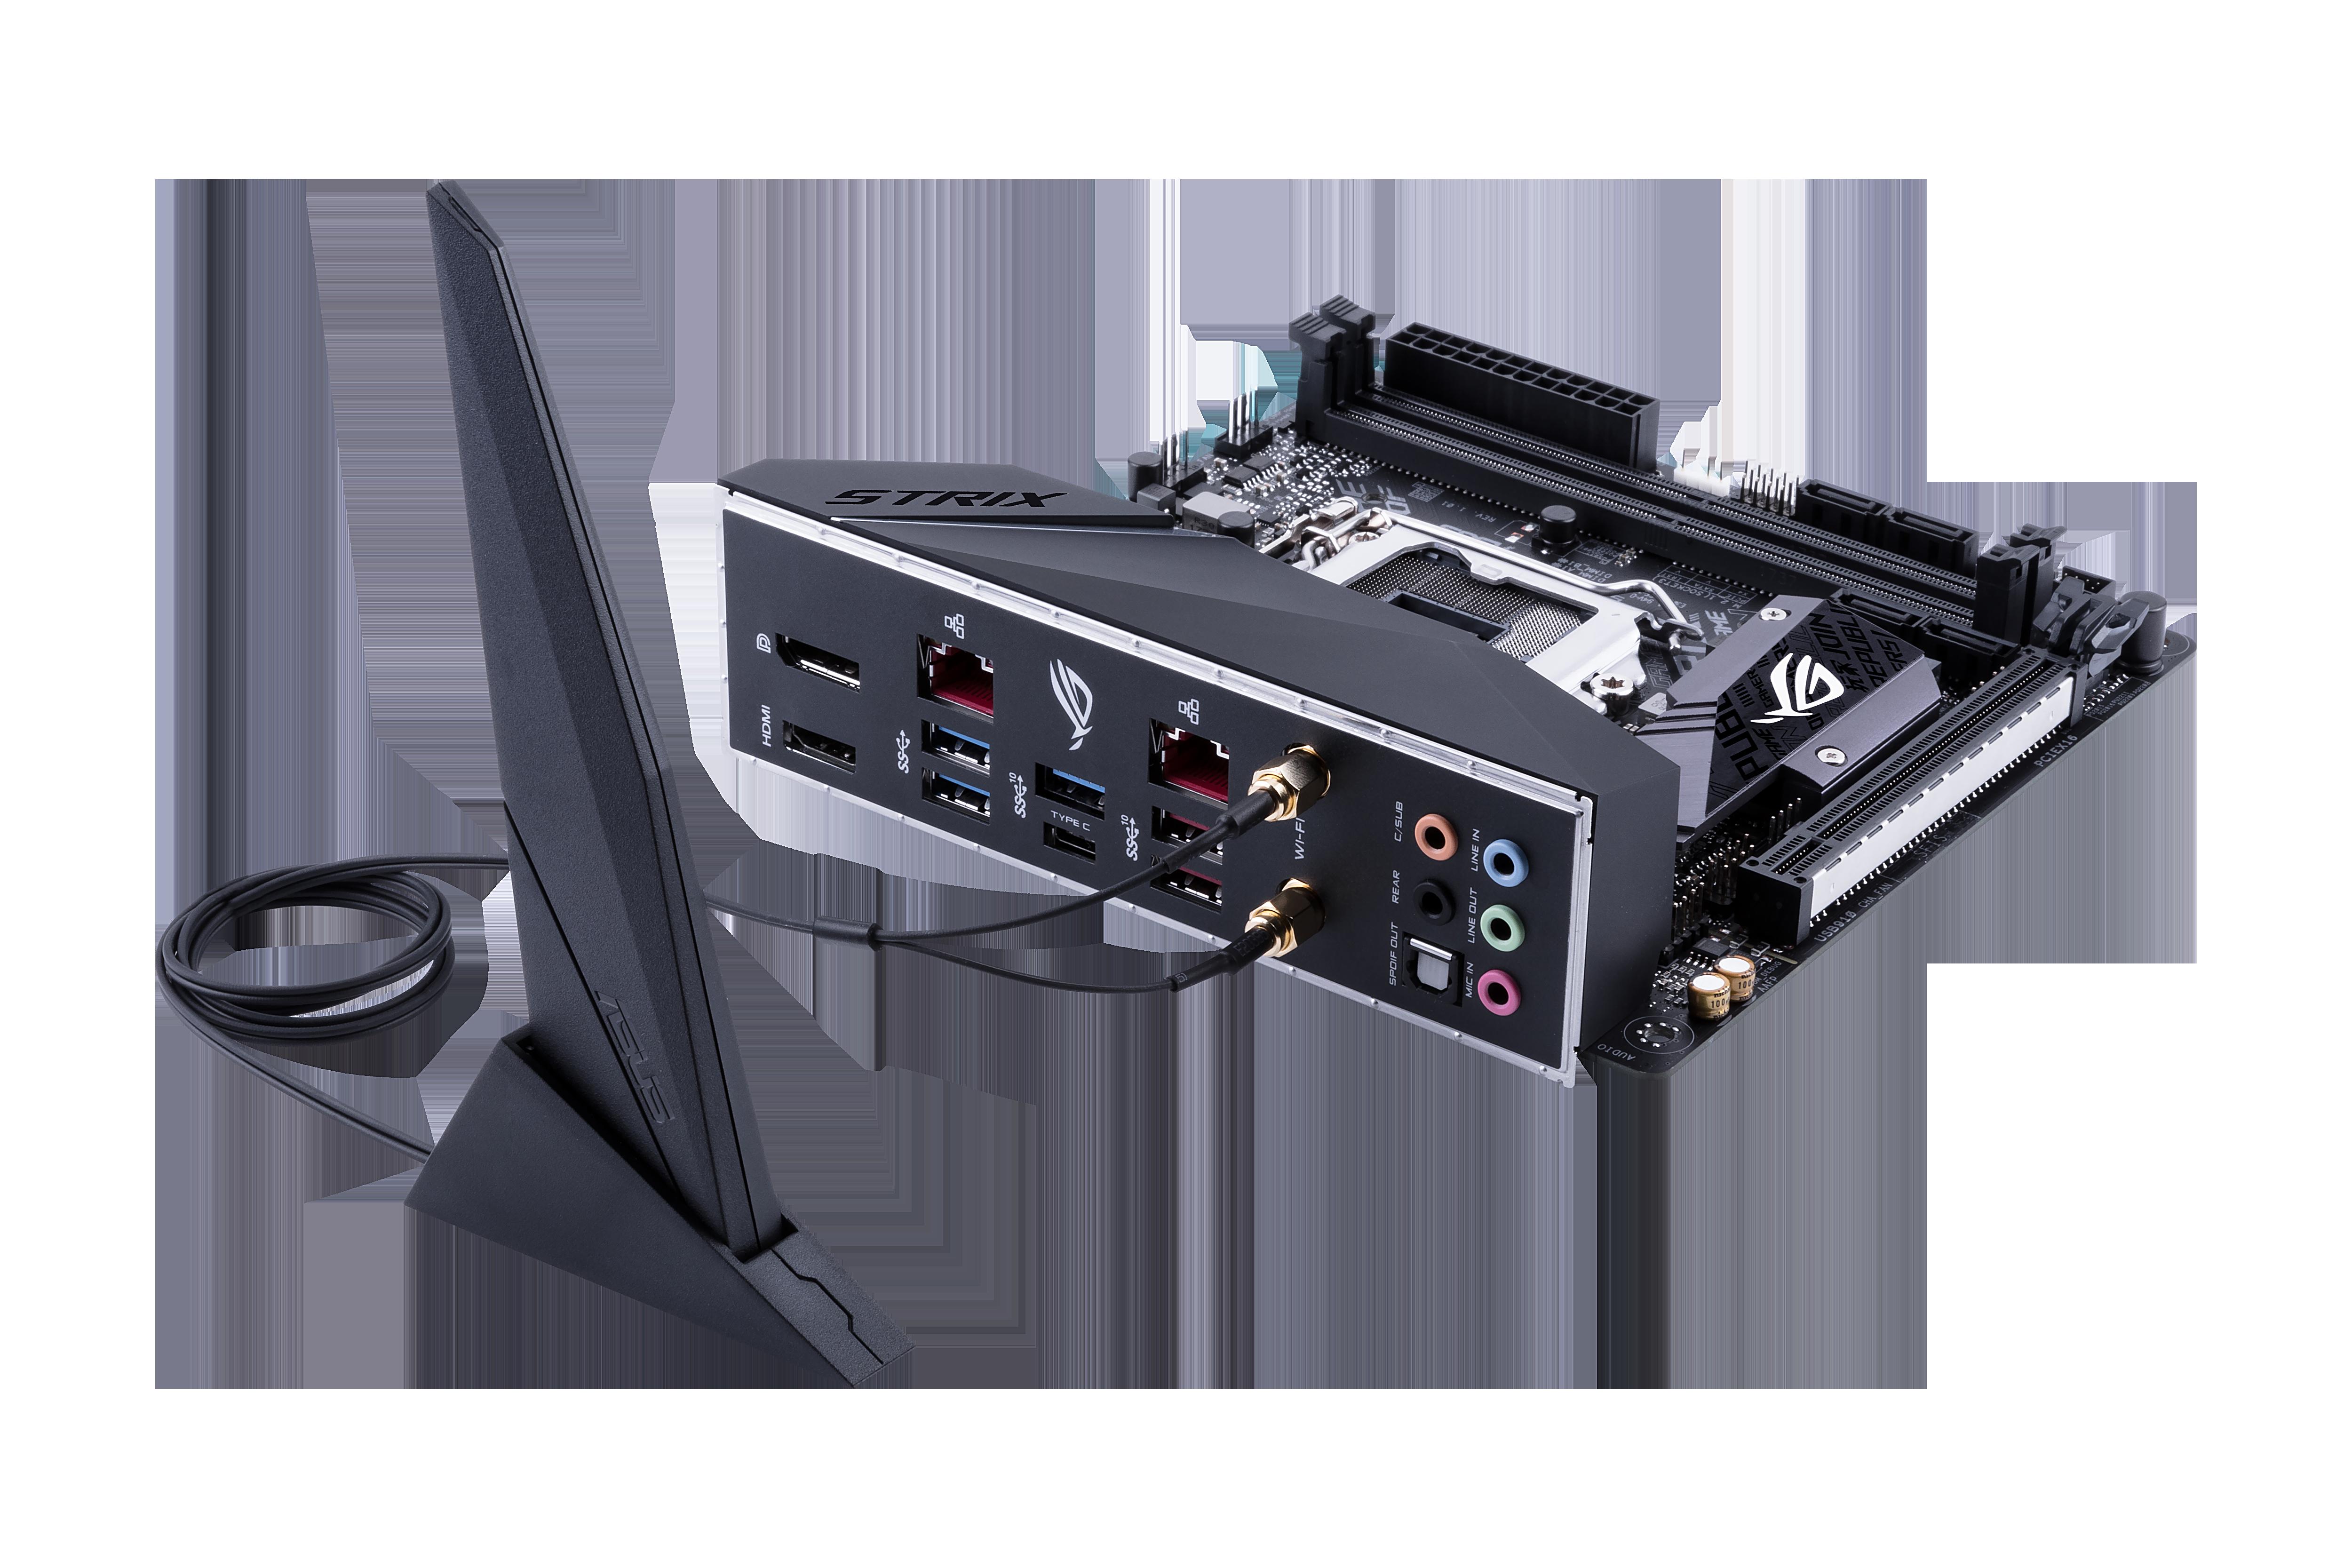 Asus Rog Strix H370 I Gaming Intel Socket 1151 90mb0we0 M0eay0 Earise F9 Portable Wireless Bluetooth Speaker Ccl Computers